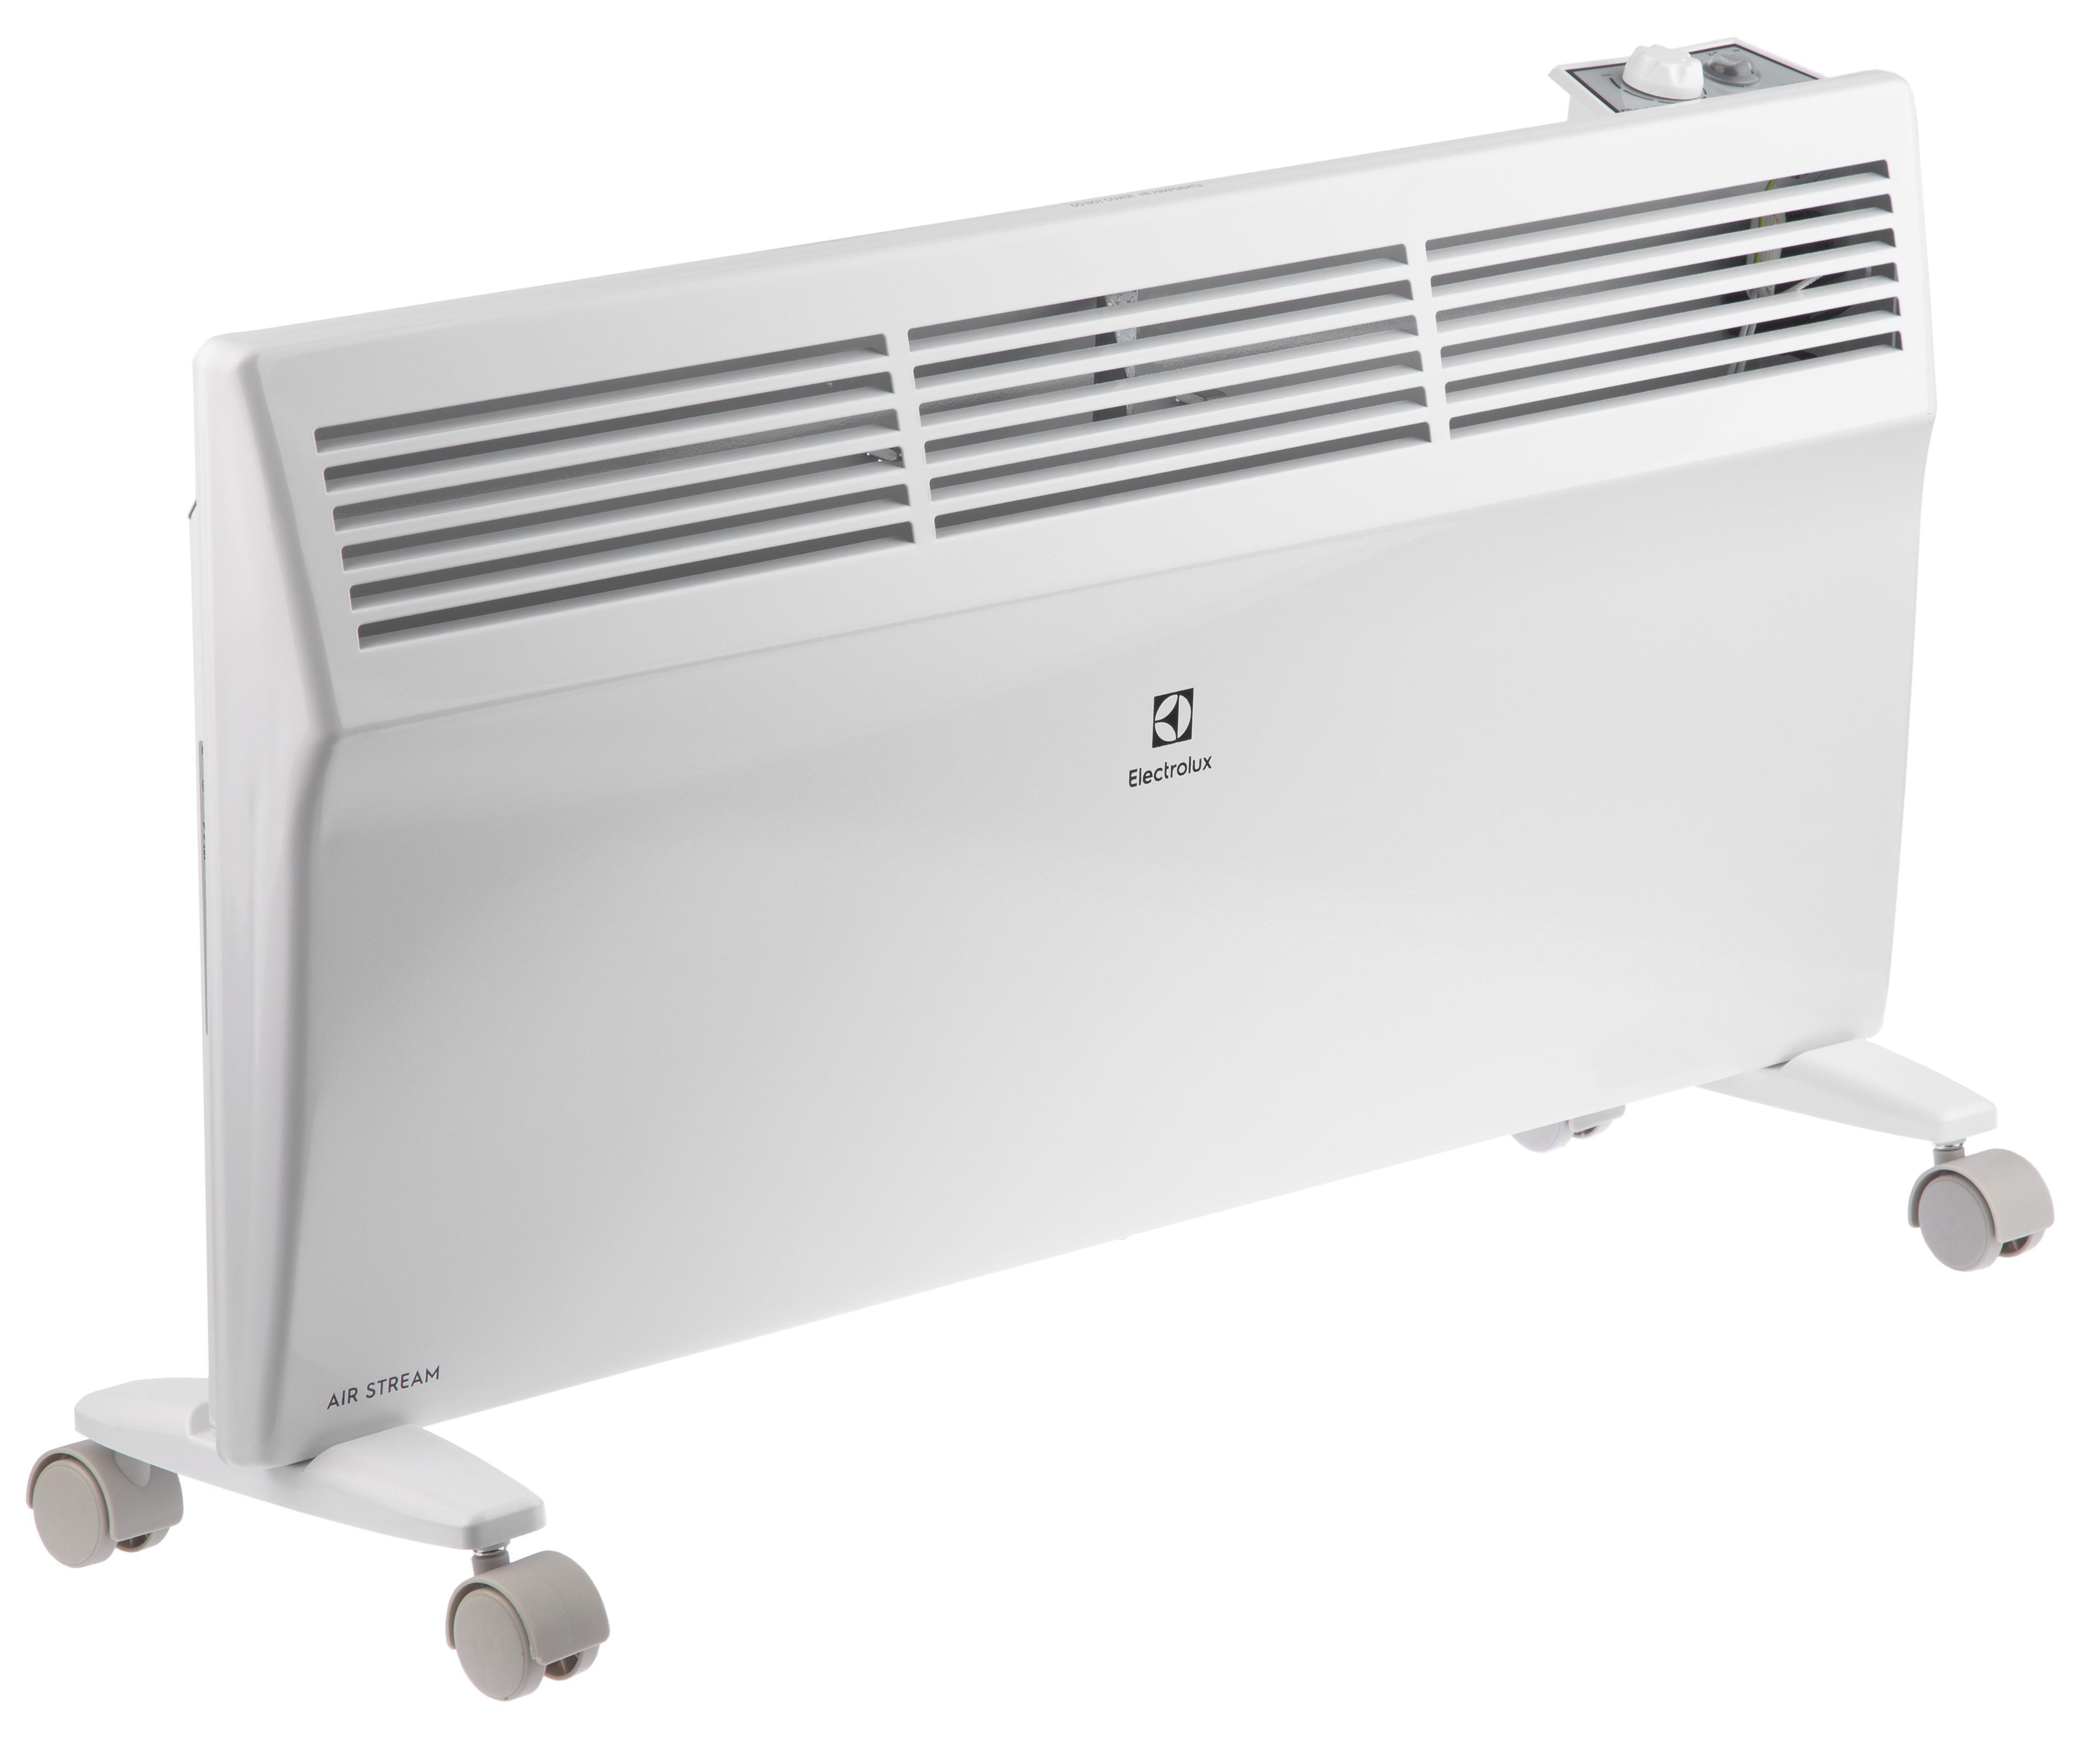 Картинка для Конвектор Electrolux Ech/as-2000 mr